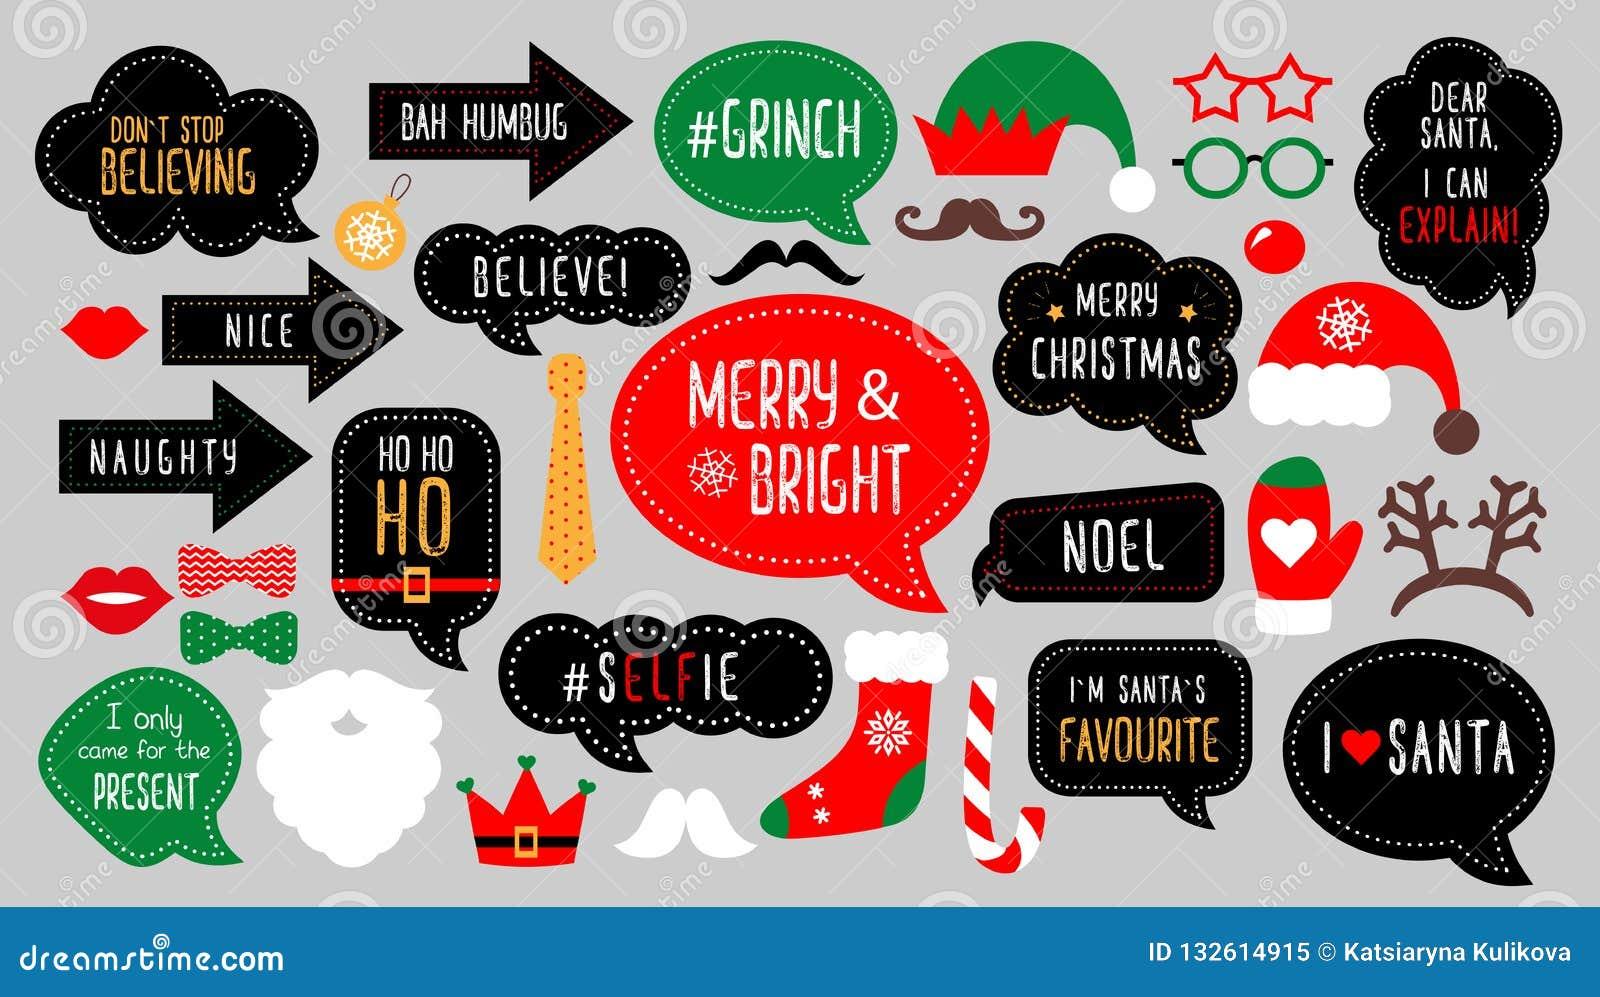 5c72d94201ed9 Grinch Christmas Hat - Christmas Decor and Lights